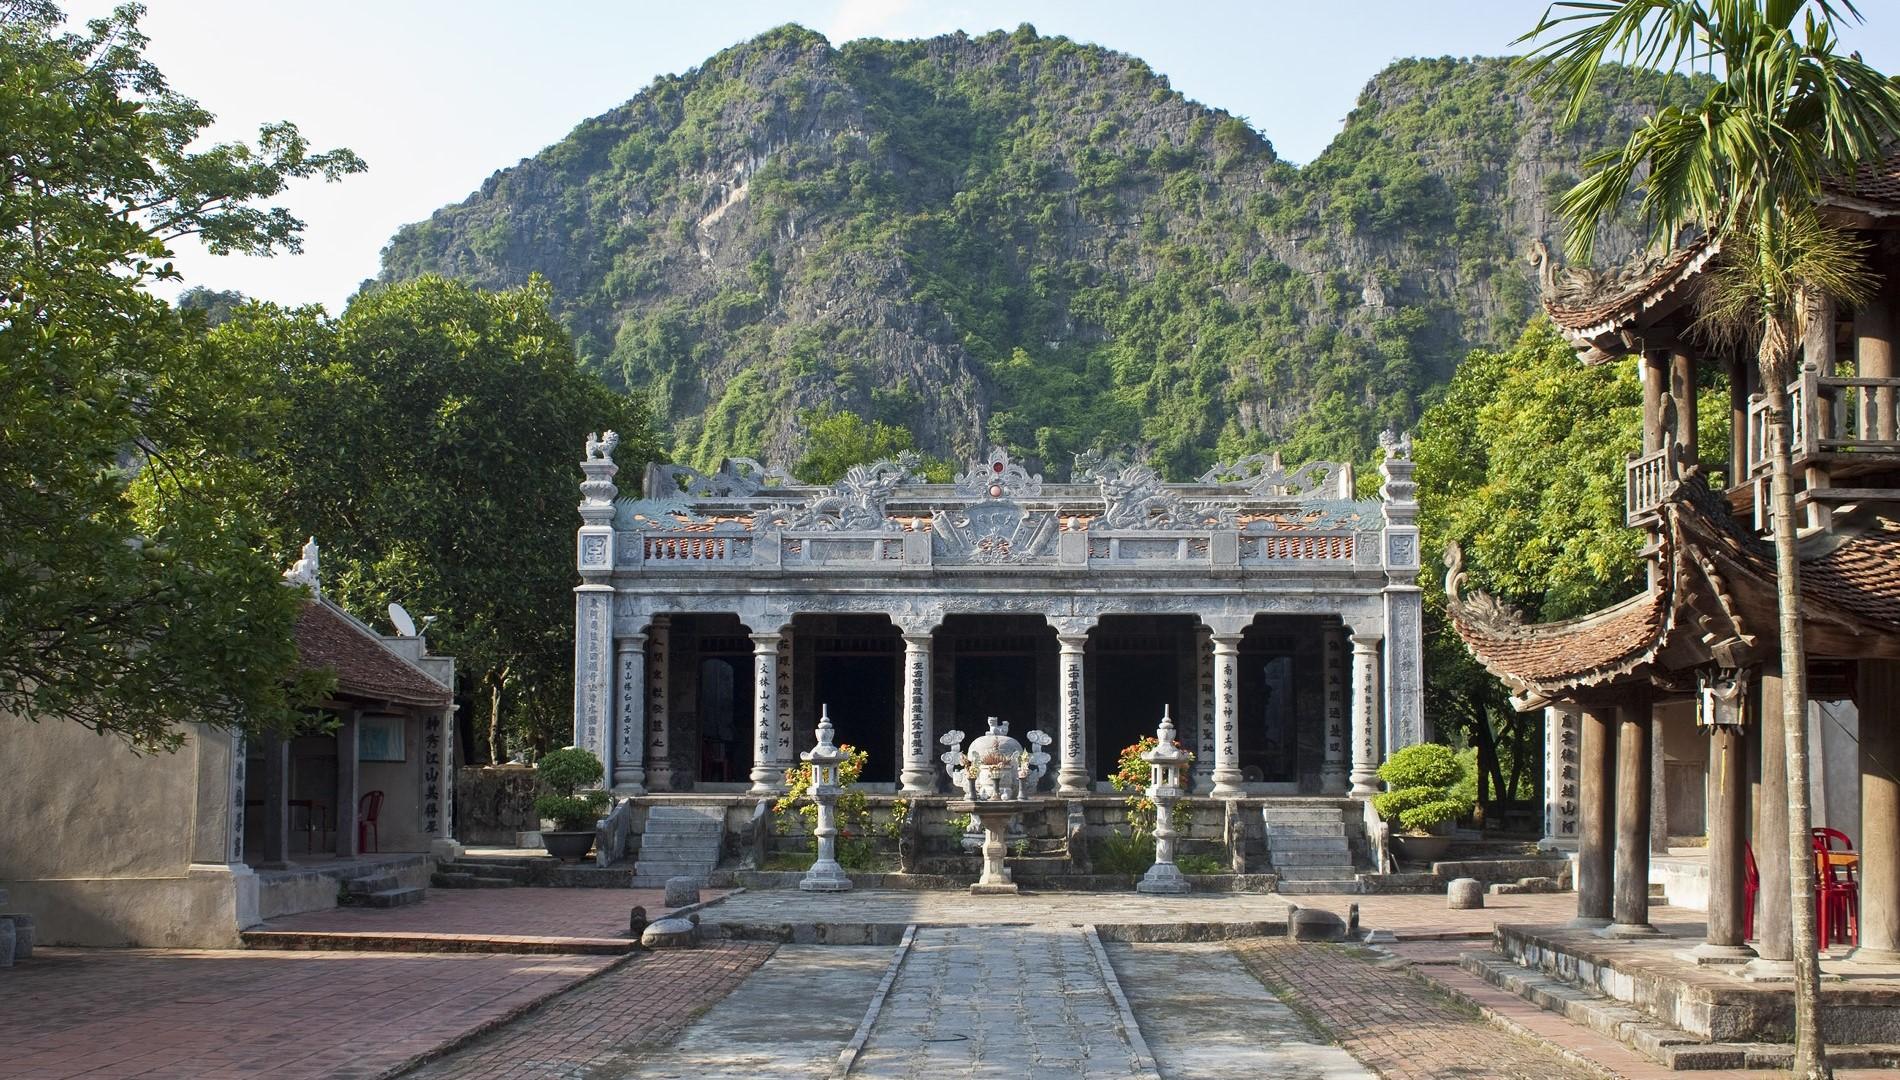 Hanoi - Ninh Binh Private Transfer by 4 Seats Car